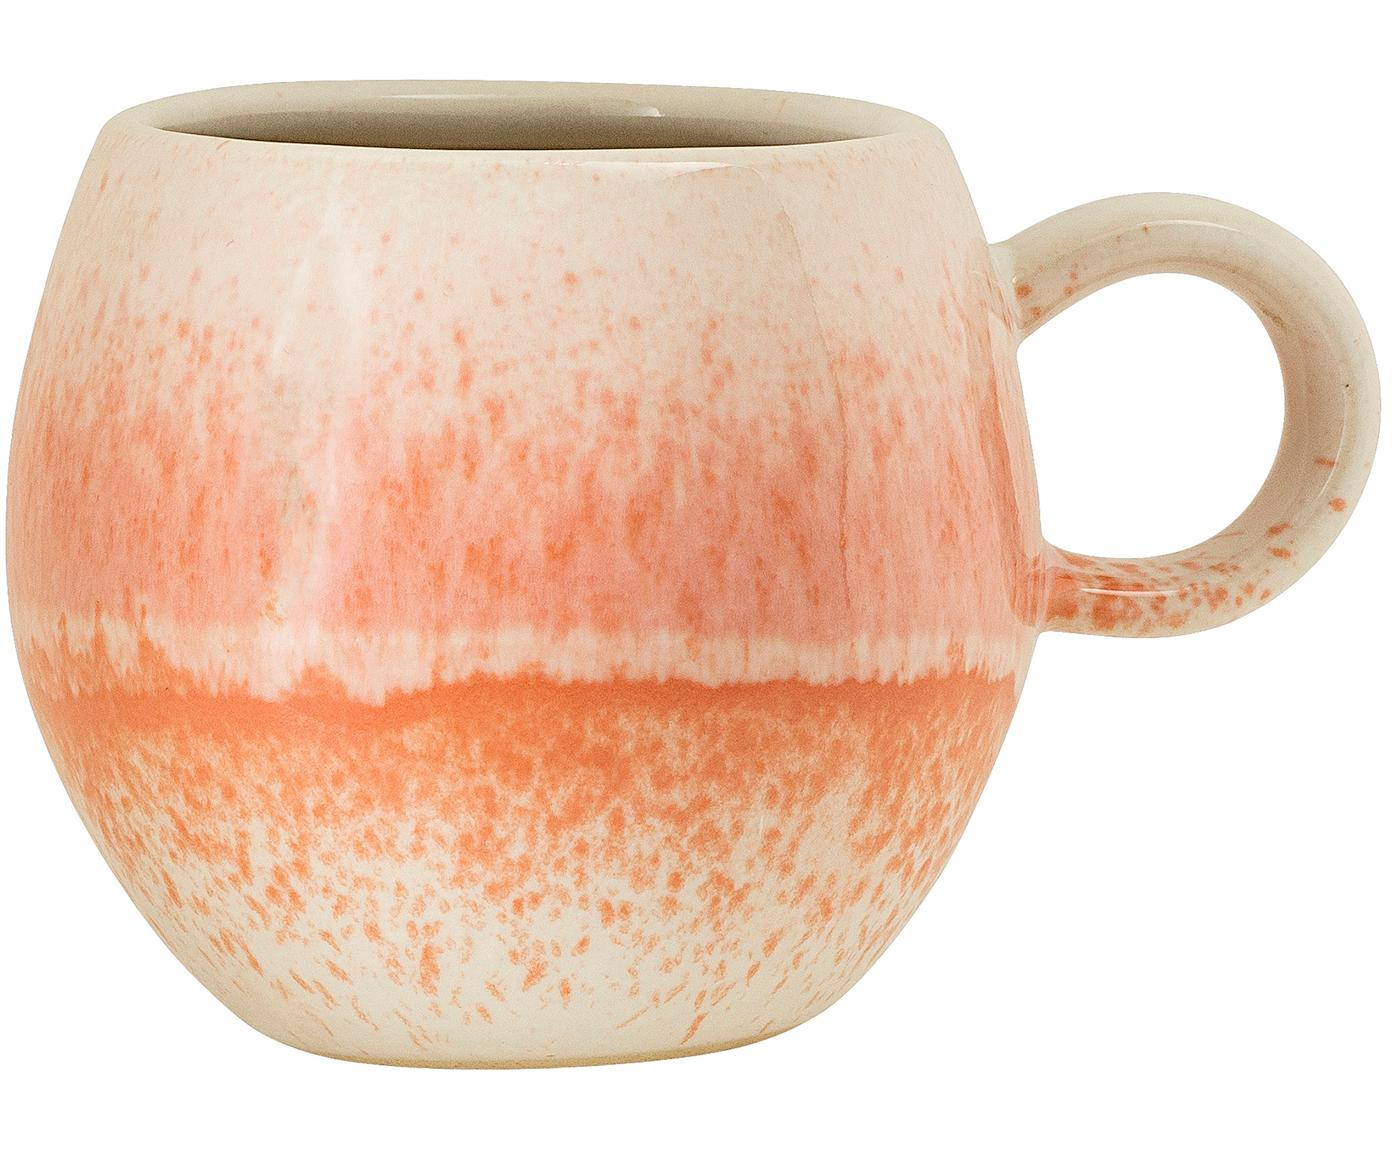 Tasse Paula, Keramik, Orange, Cremefarben, Ø 9 x H 8 cm